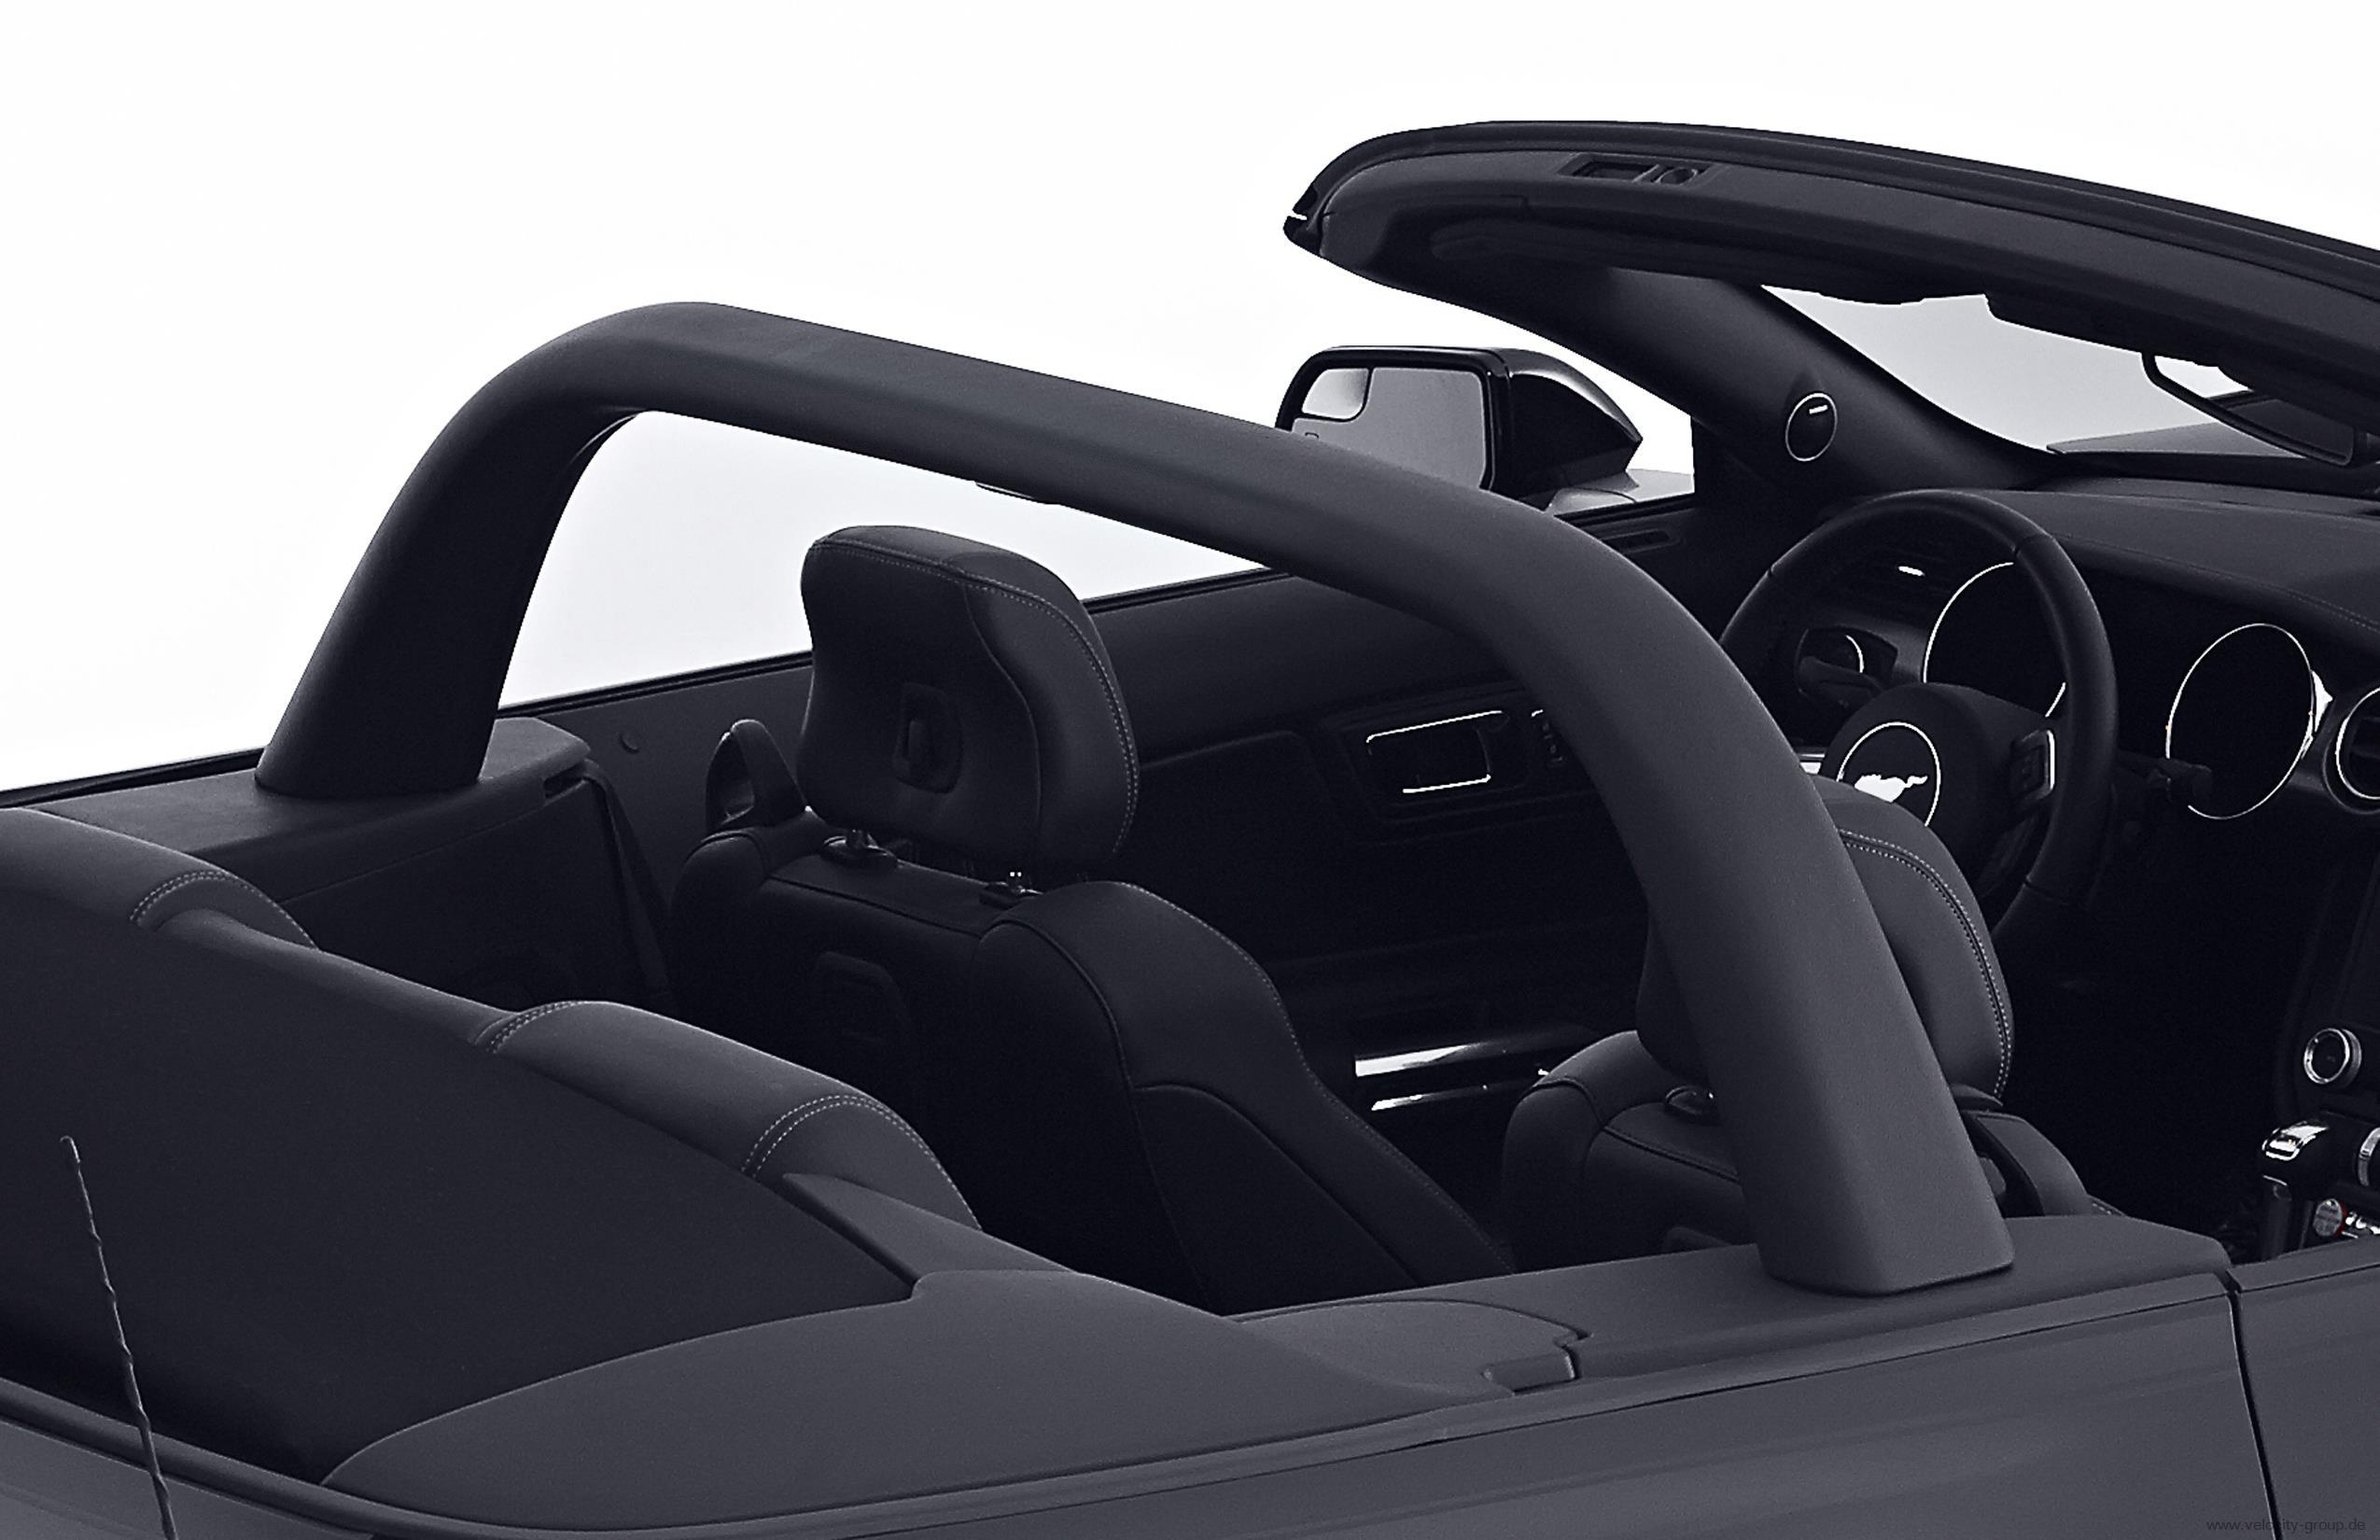 15 19 ford mustang cabrio berrollb gel schwarz ohne. Black Bedroom Furniture Sets. Home Design Ideas